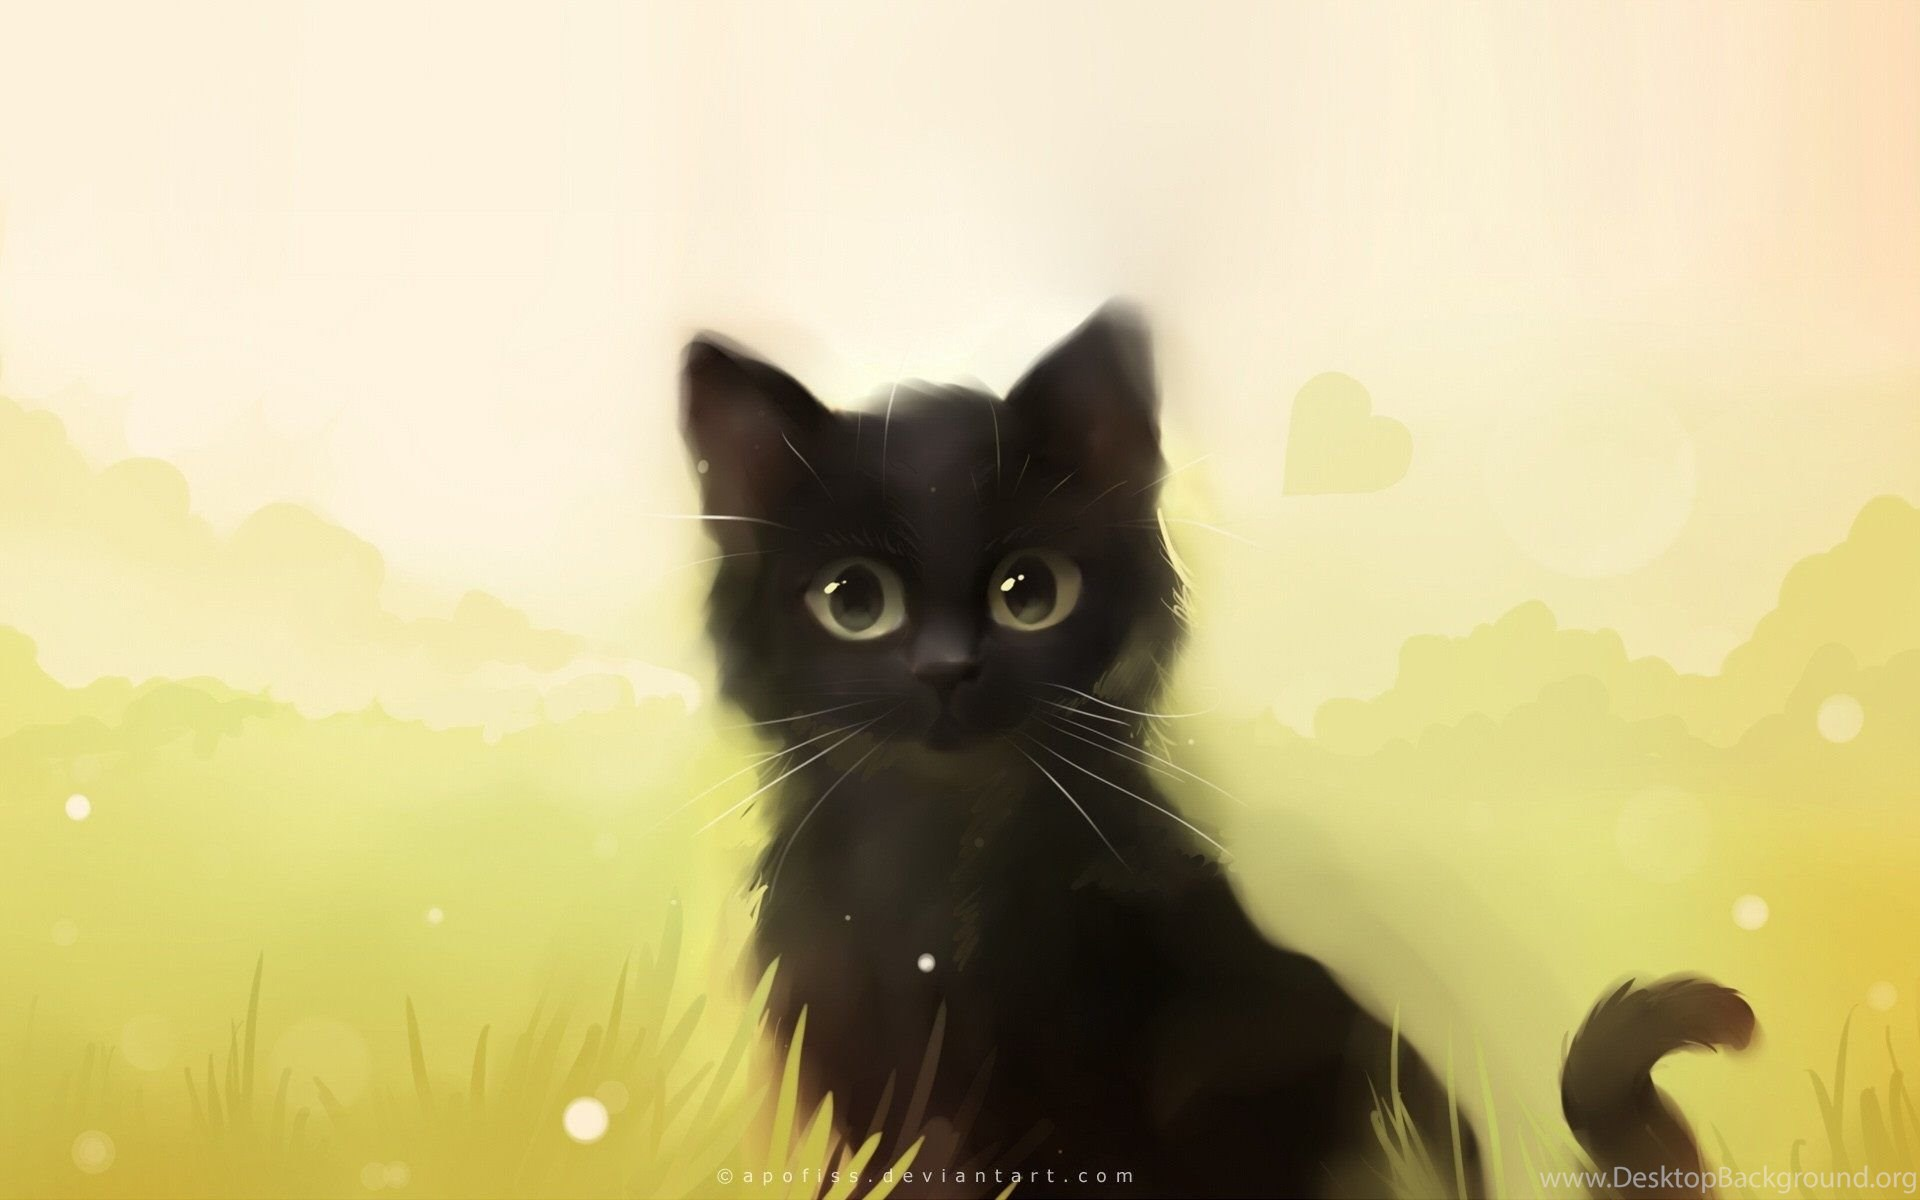 Beautiful Cat Painting Wallpapers Hd Download Of Cute Cat Desktop Background